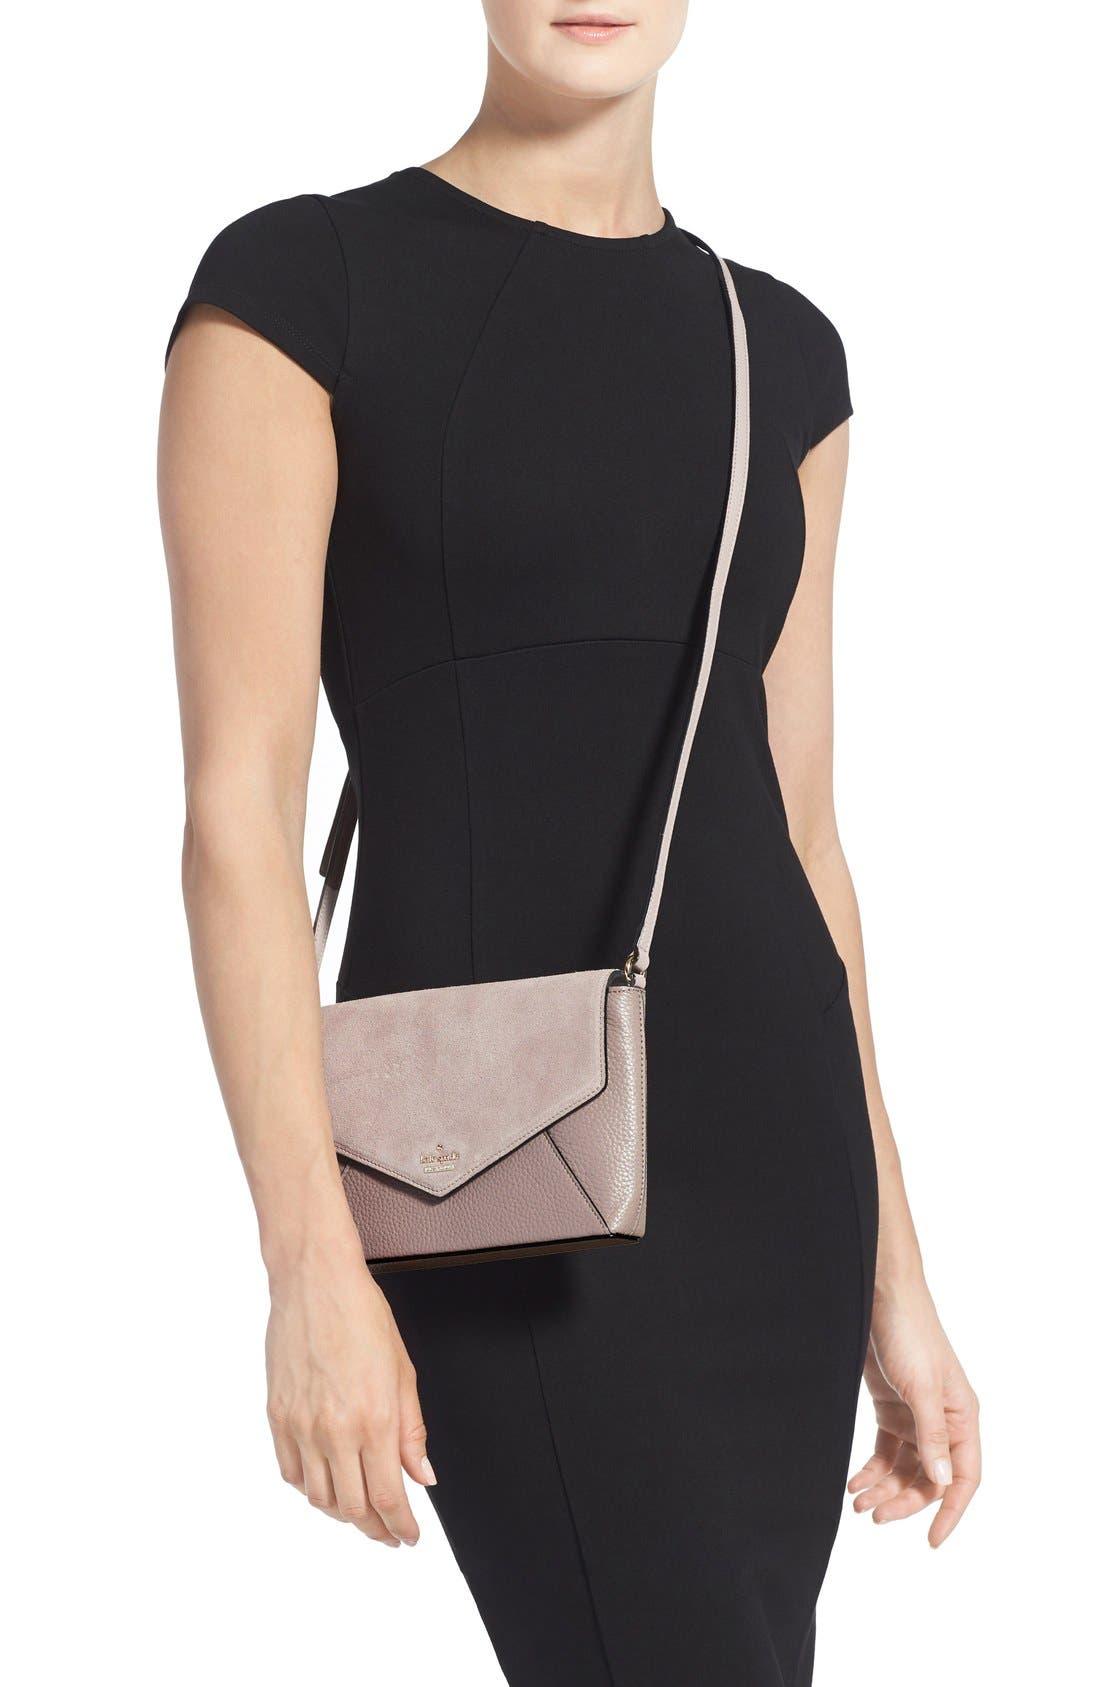 Alternate Image 2  - kate spade new york 'spencer court - large monday' suede & leather envelope crossbody bag (Nordstrom Exclusive)